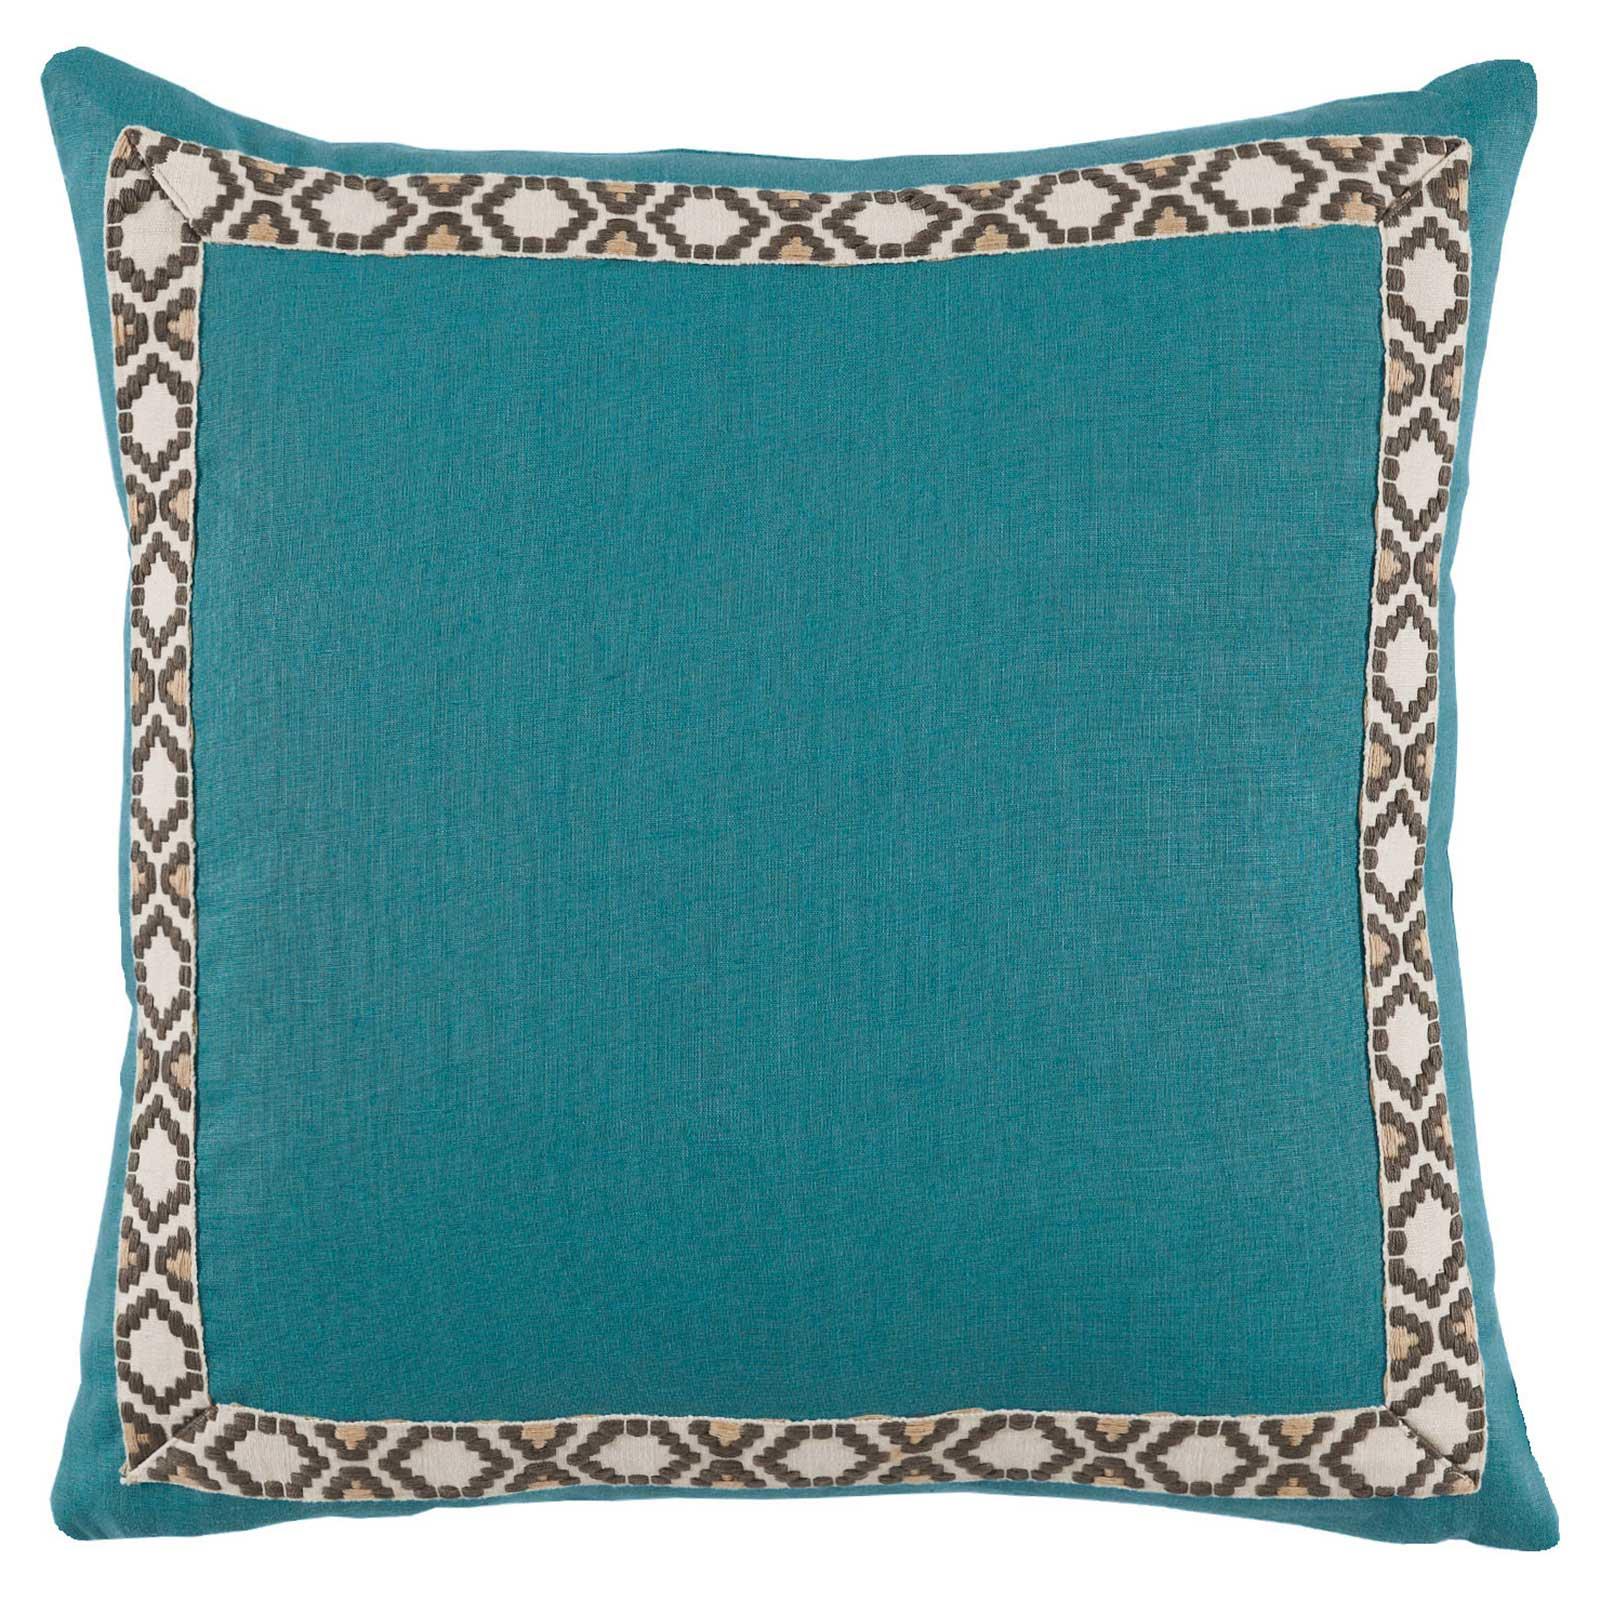 Kaia Global Deep Teal Linen Trim Band Pillow - 24x24